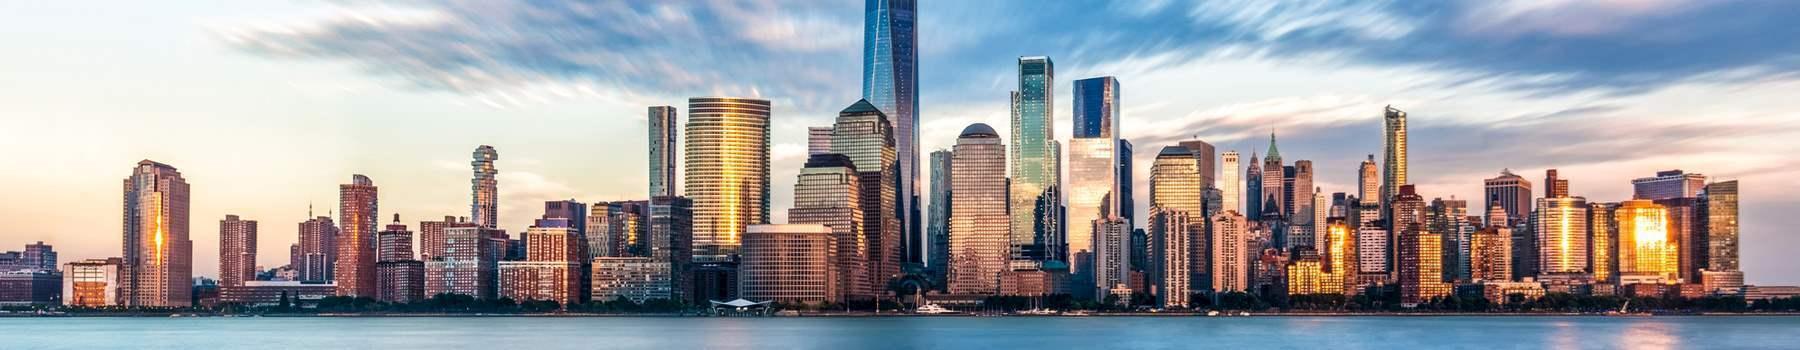 Radio City Music Hall of Newyork top